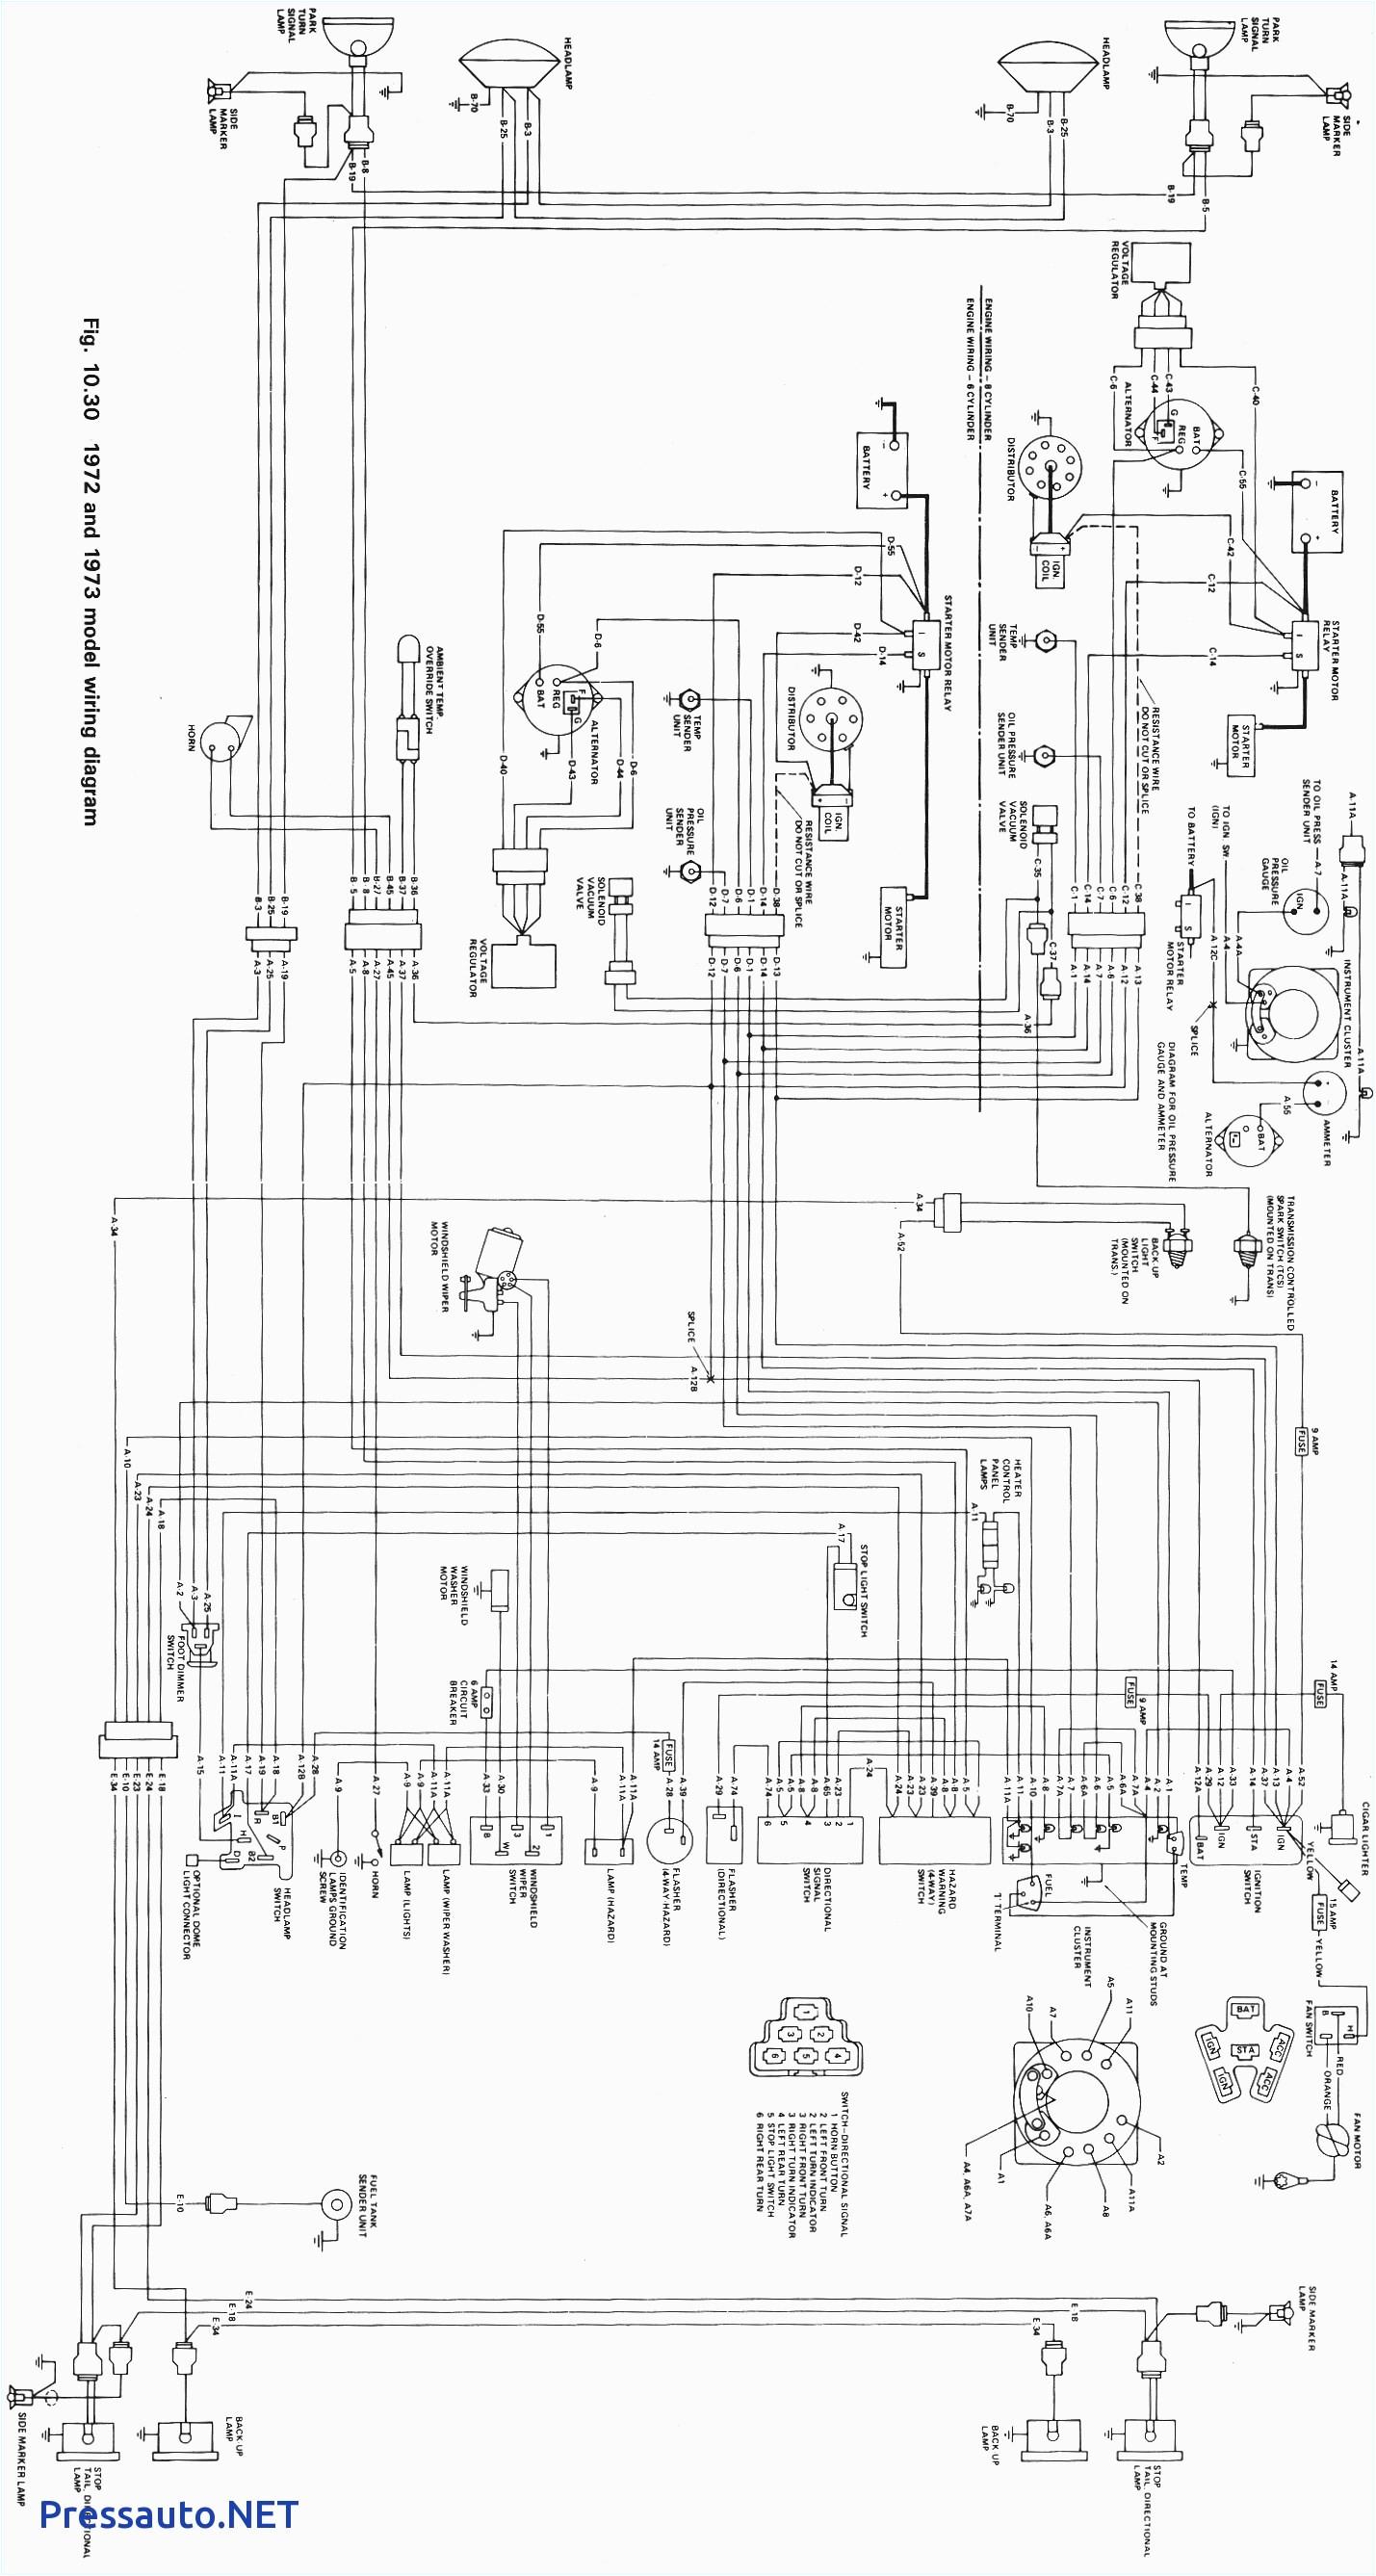 wiring diagram 76 jeep cj7 wiring diagram usedcj7 wiring diagram pdf wiring diagram datasource wiring diagram